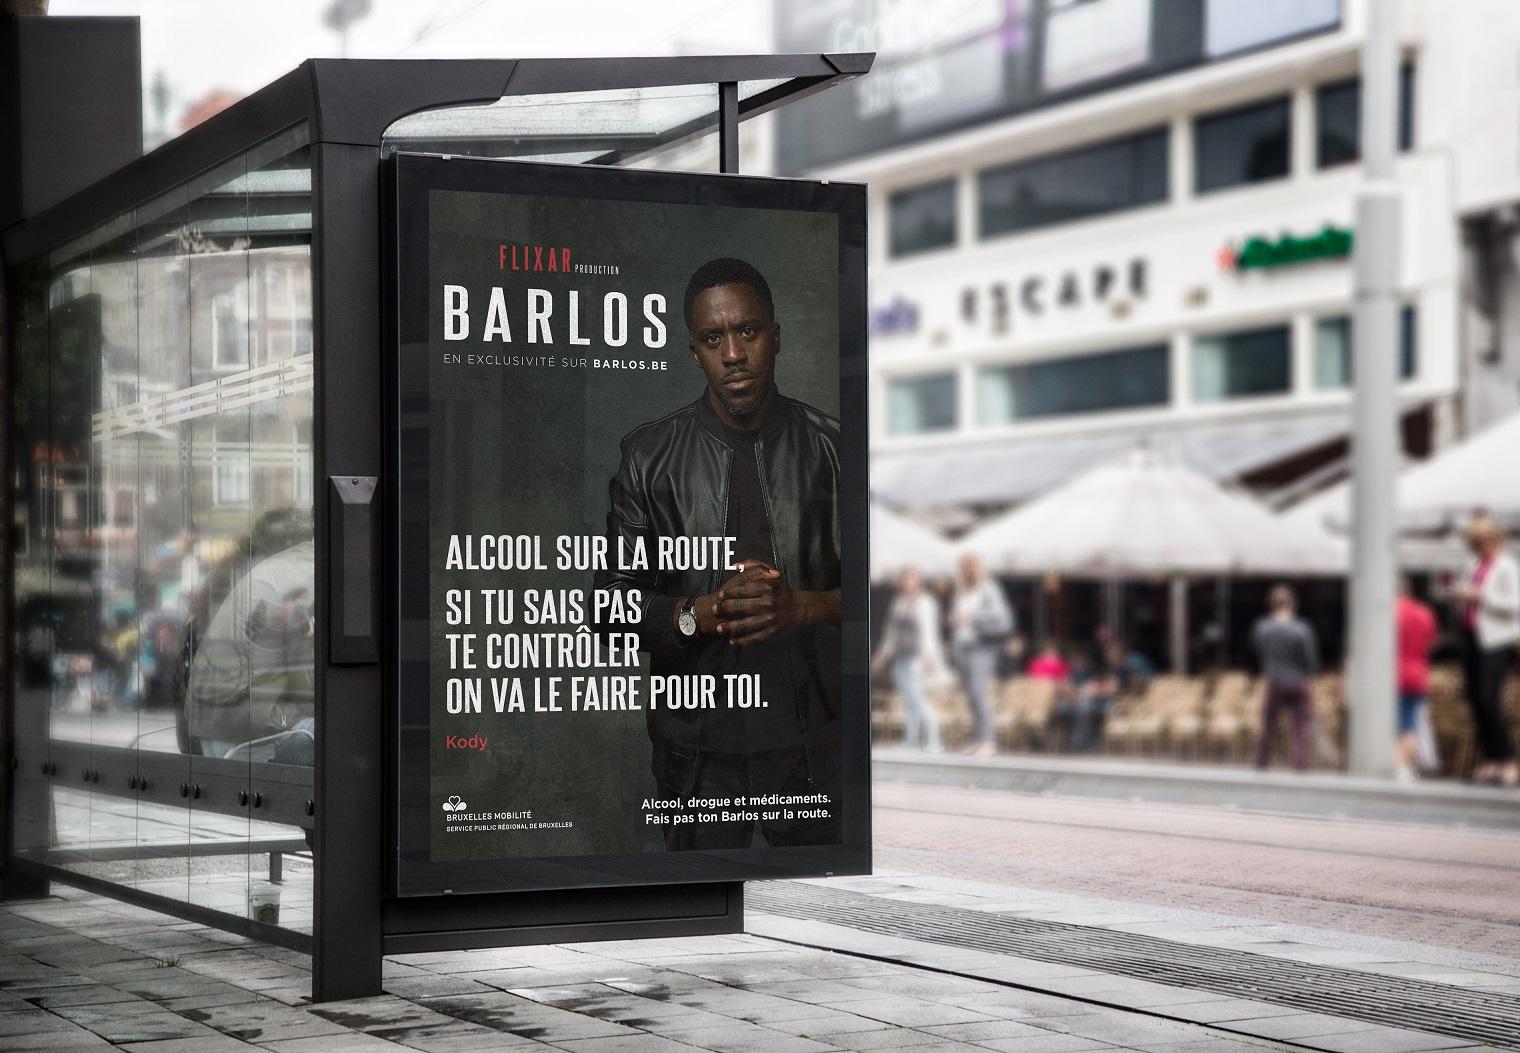 Barlos-Kody_Abribus 40